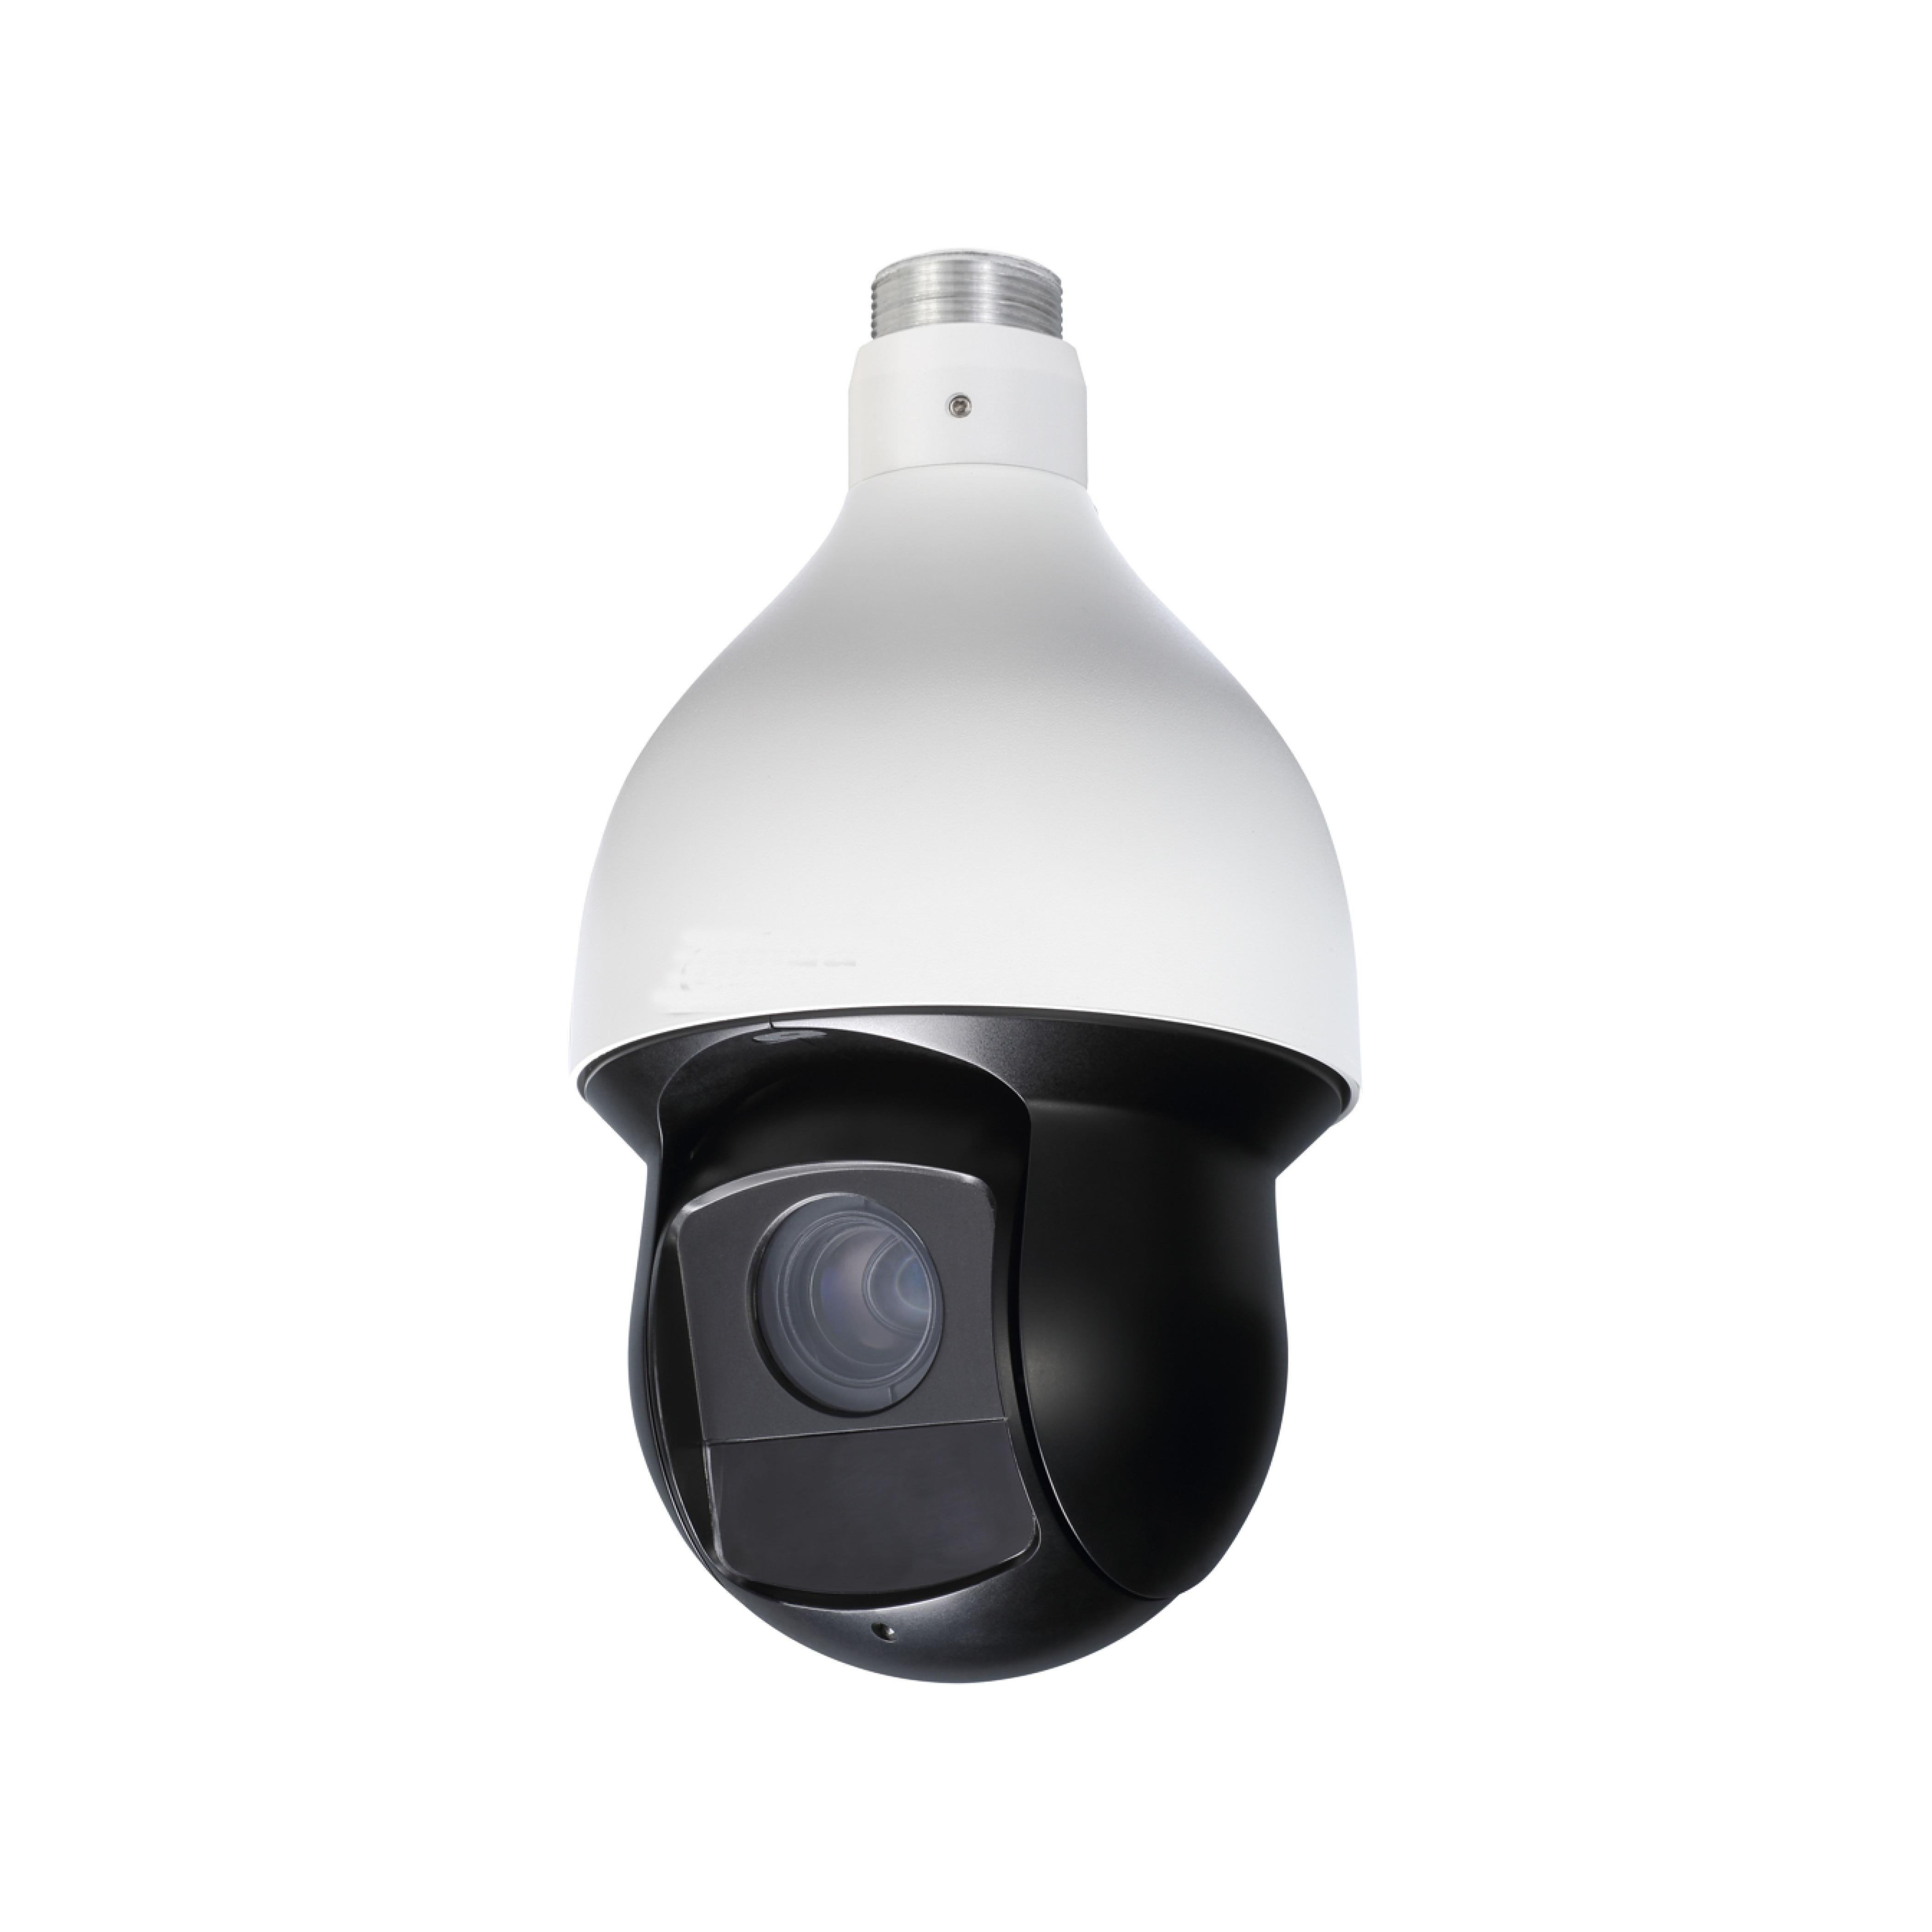 CCTV 2MP 25x Starlight IR PTZ Network IP Camera 4 8 120mm 150m IR Starlight H